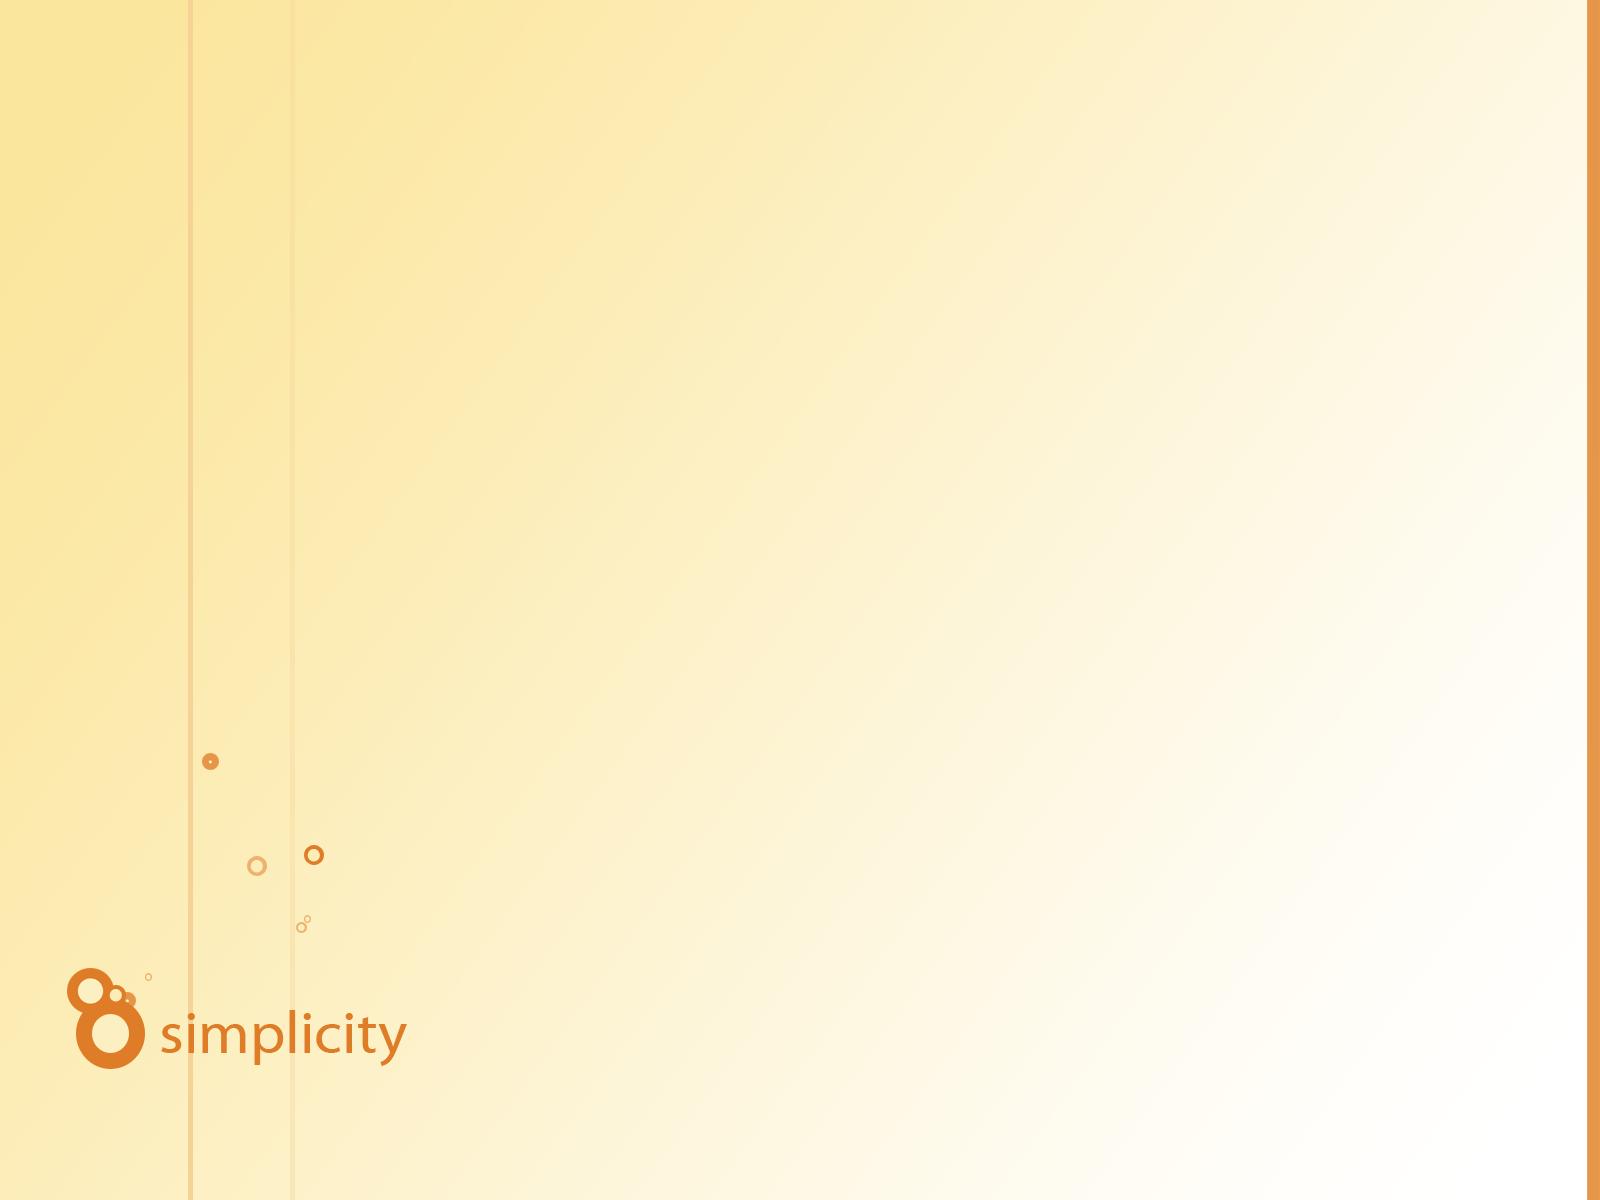 simplicity by emberInc